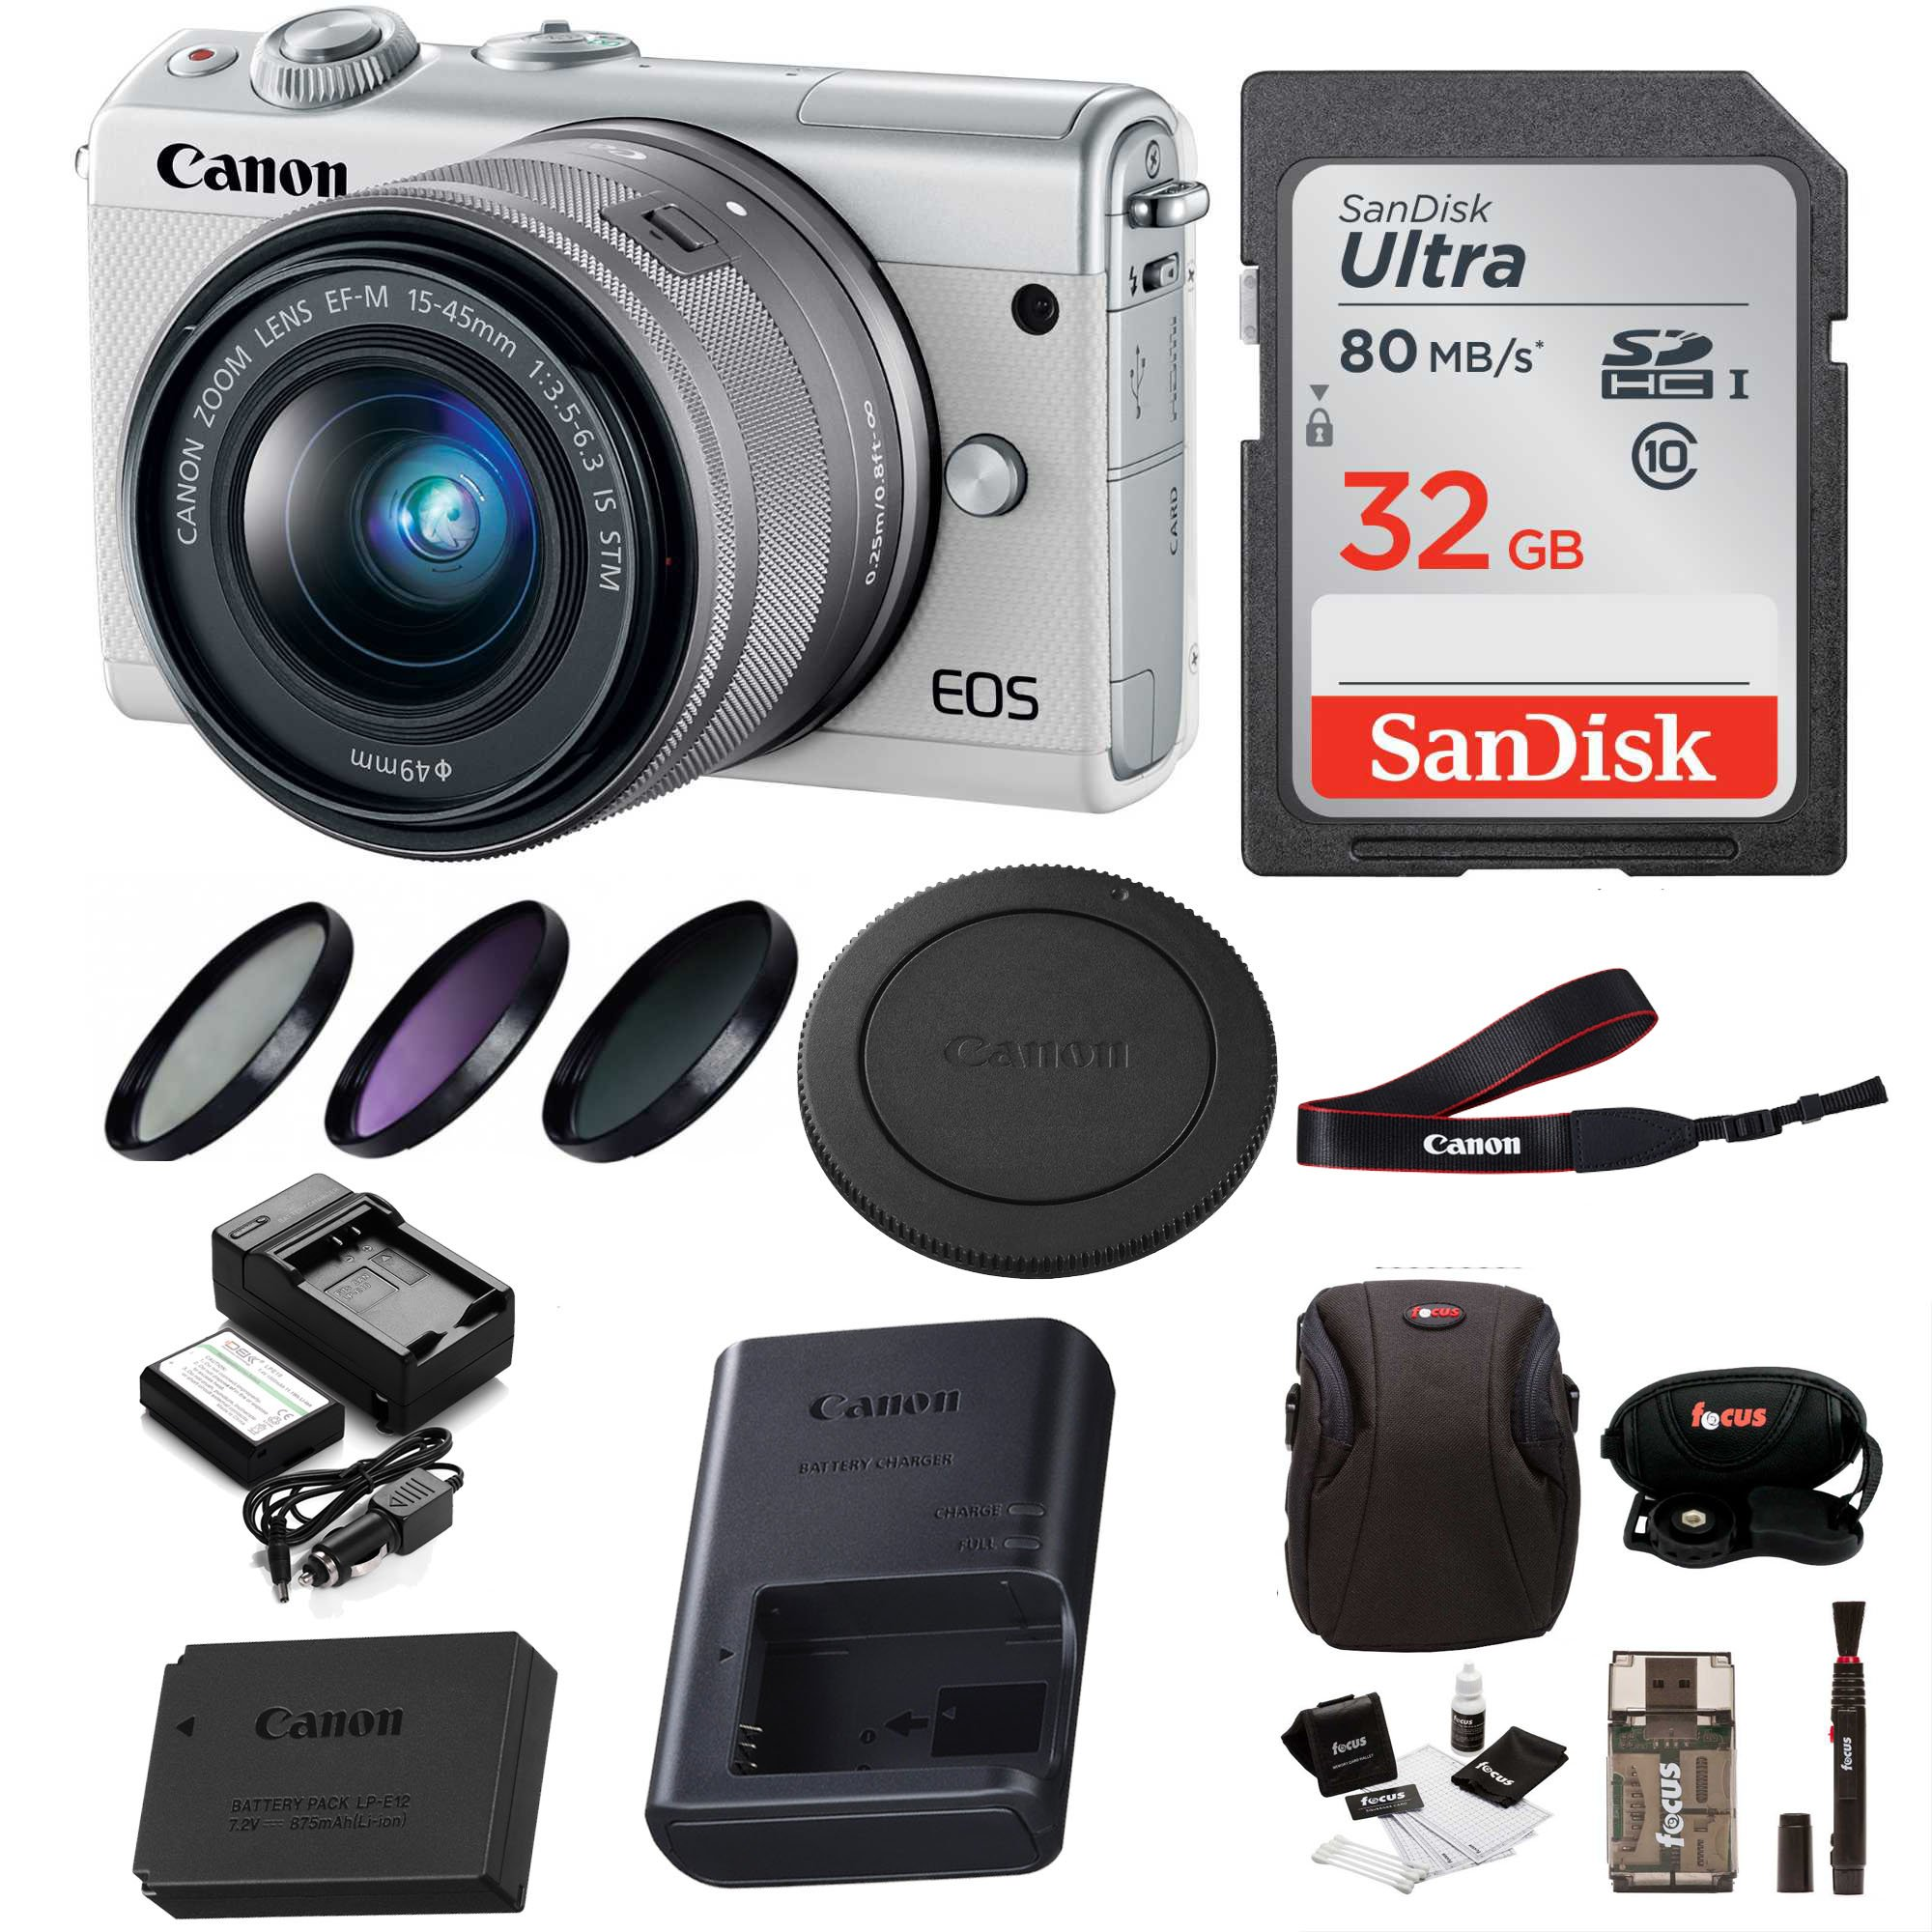 Canon EOS M100 Mirrorless Digital Camera EF-M 15-45mm lens (White) + 32GB Memory Card + Filter Kit + Bundle by Focus Camera